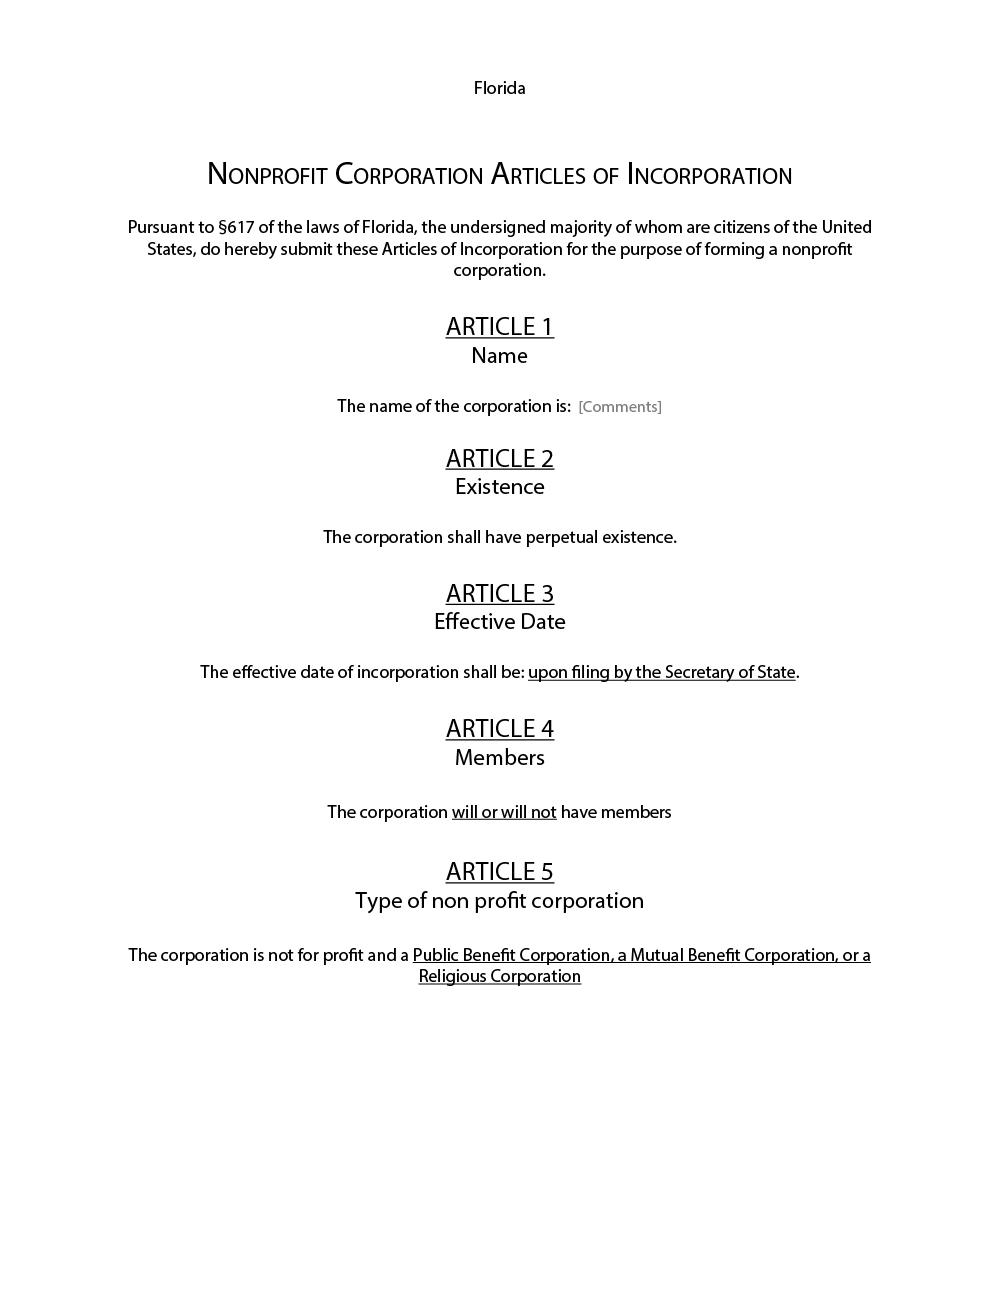 Free articles of incorporation washington state non profit.